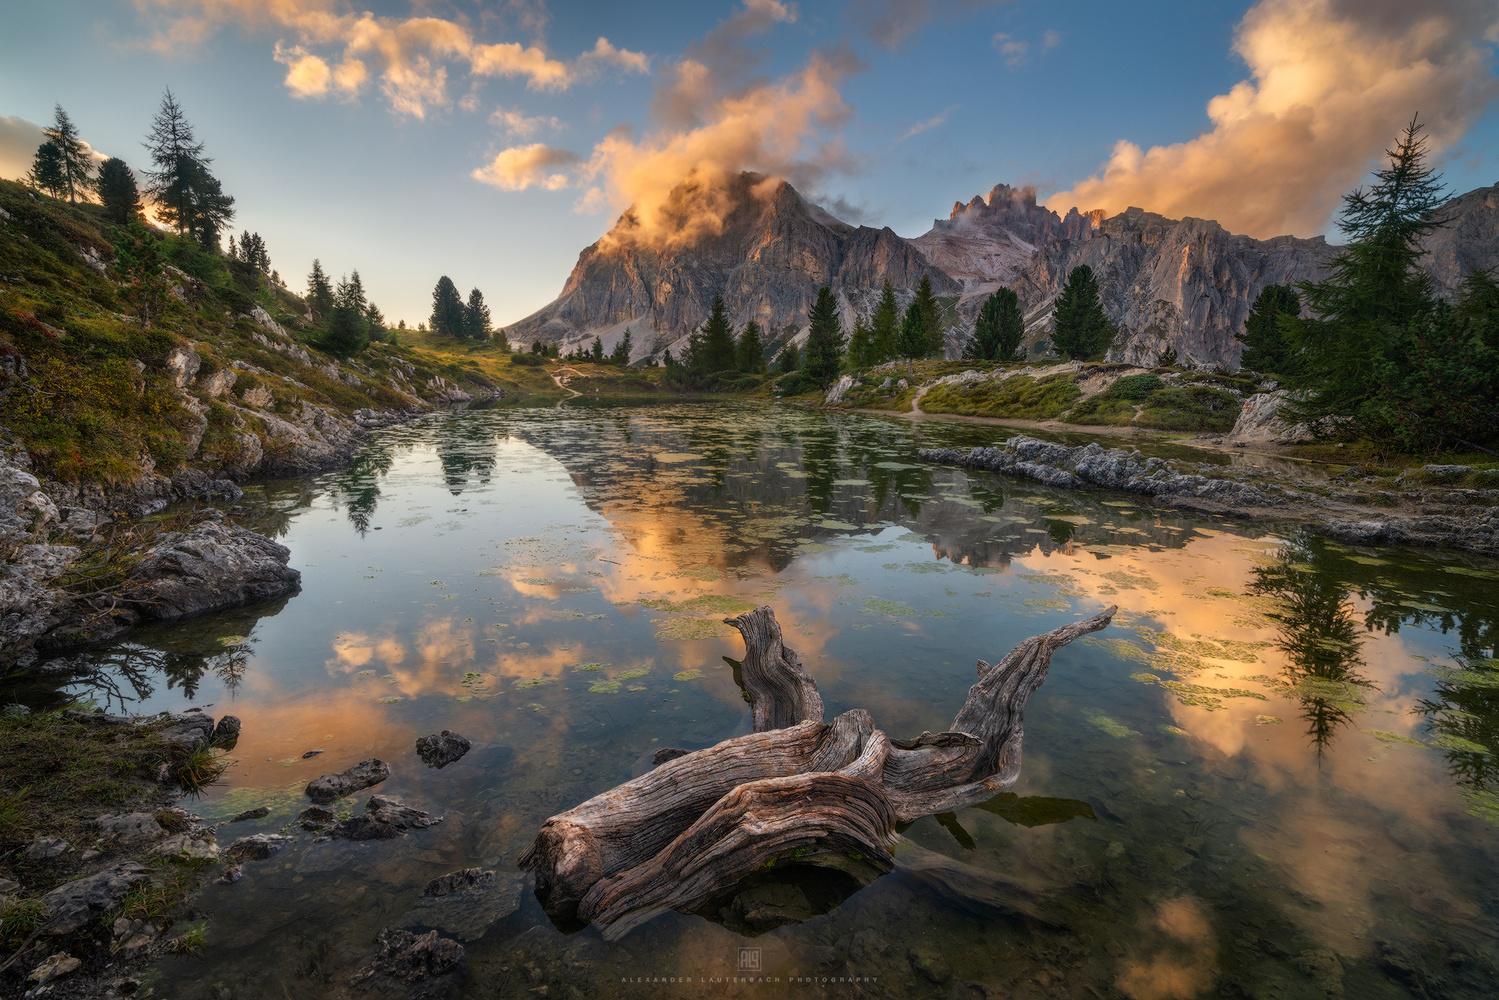 Lago di Limides by Alexander Lauterbach